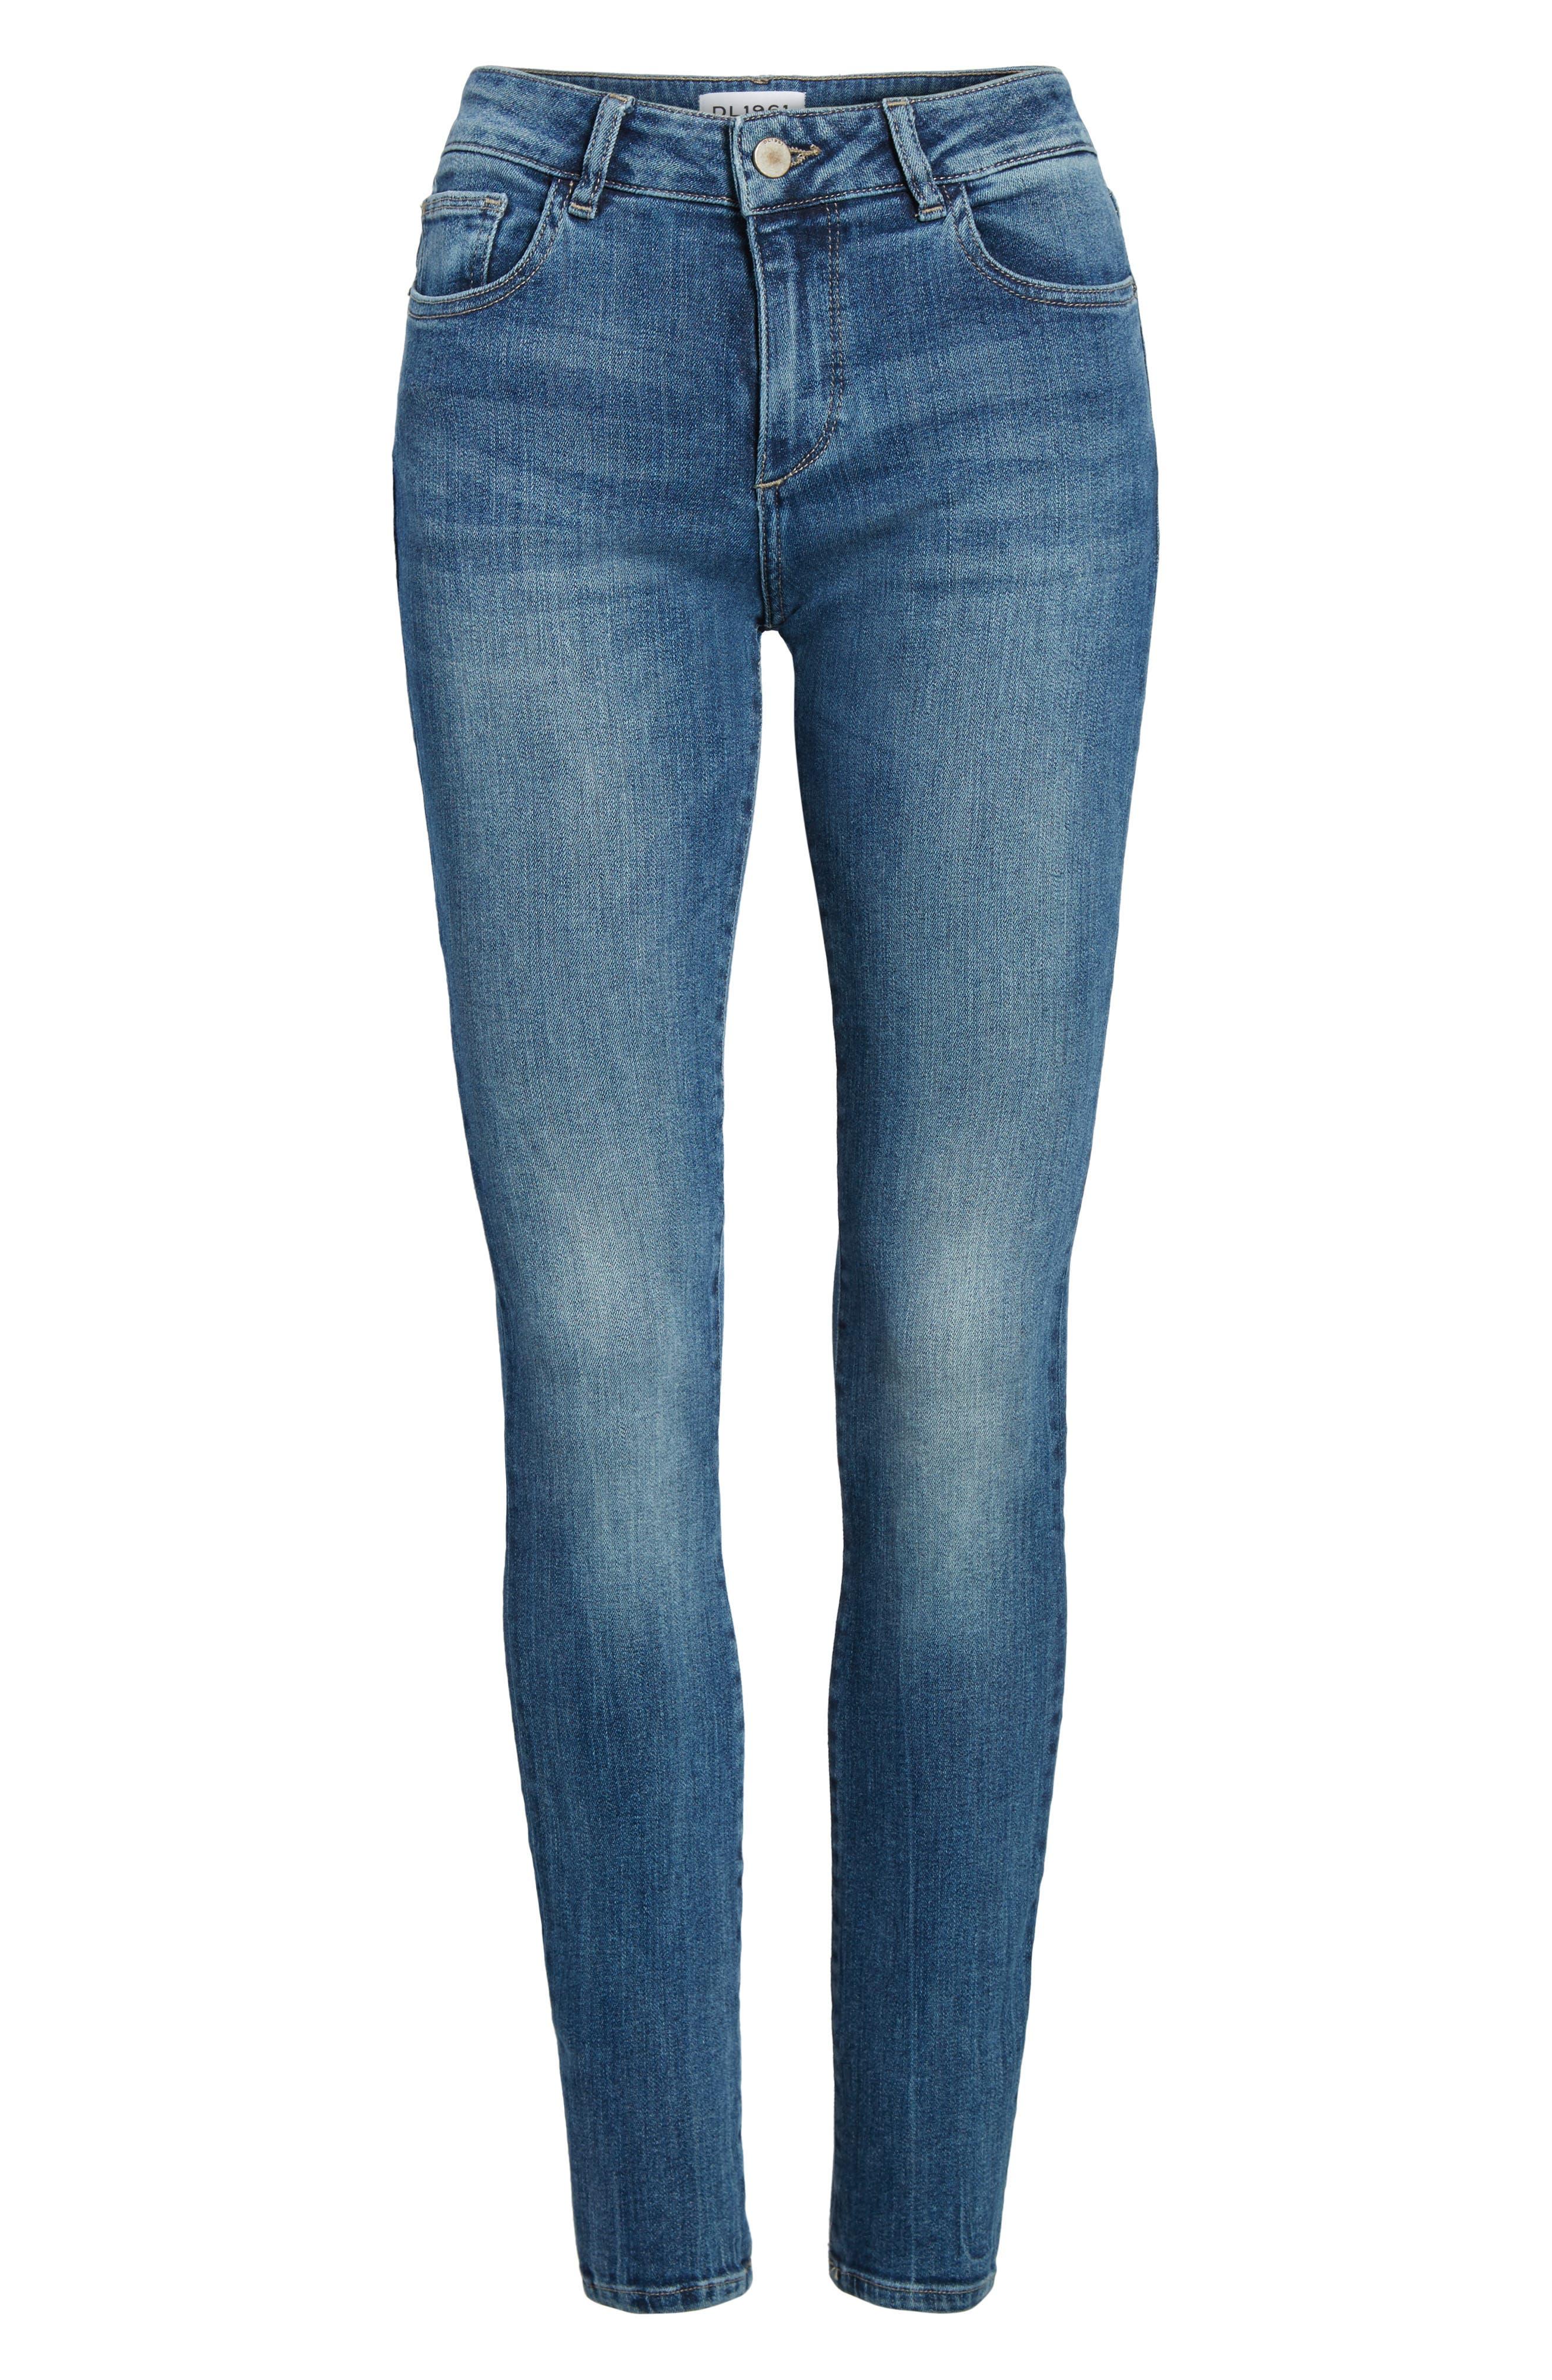 Florence Instasculpt Skinny Jeans,                             Alternate thumbnail 7, color,                             405